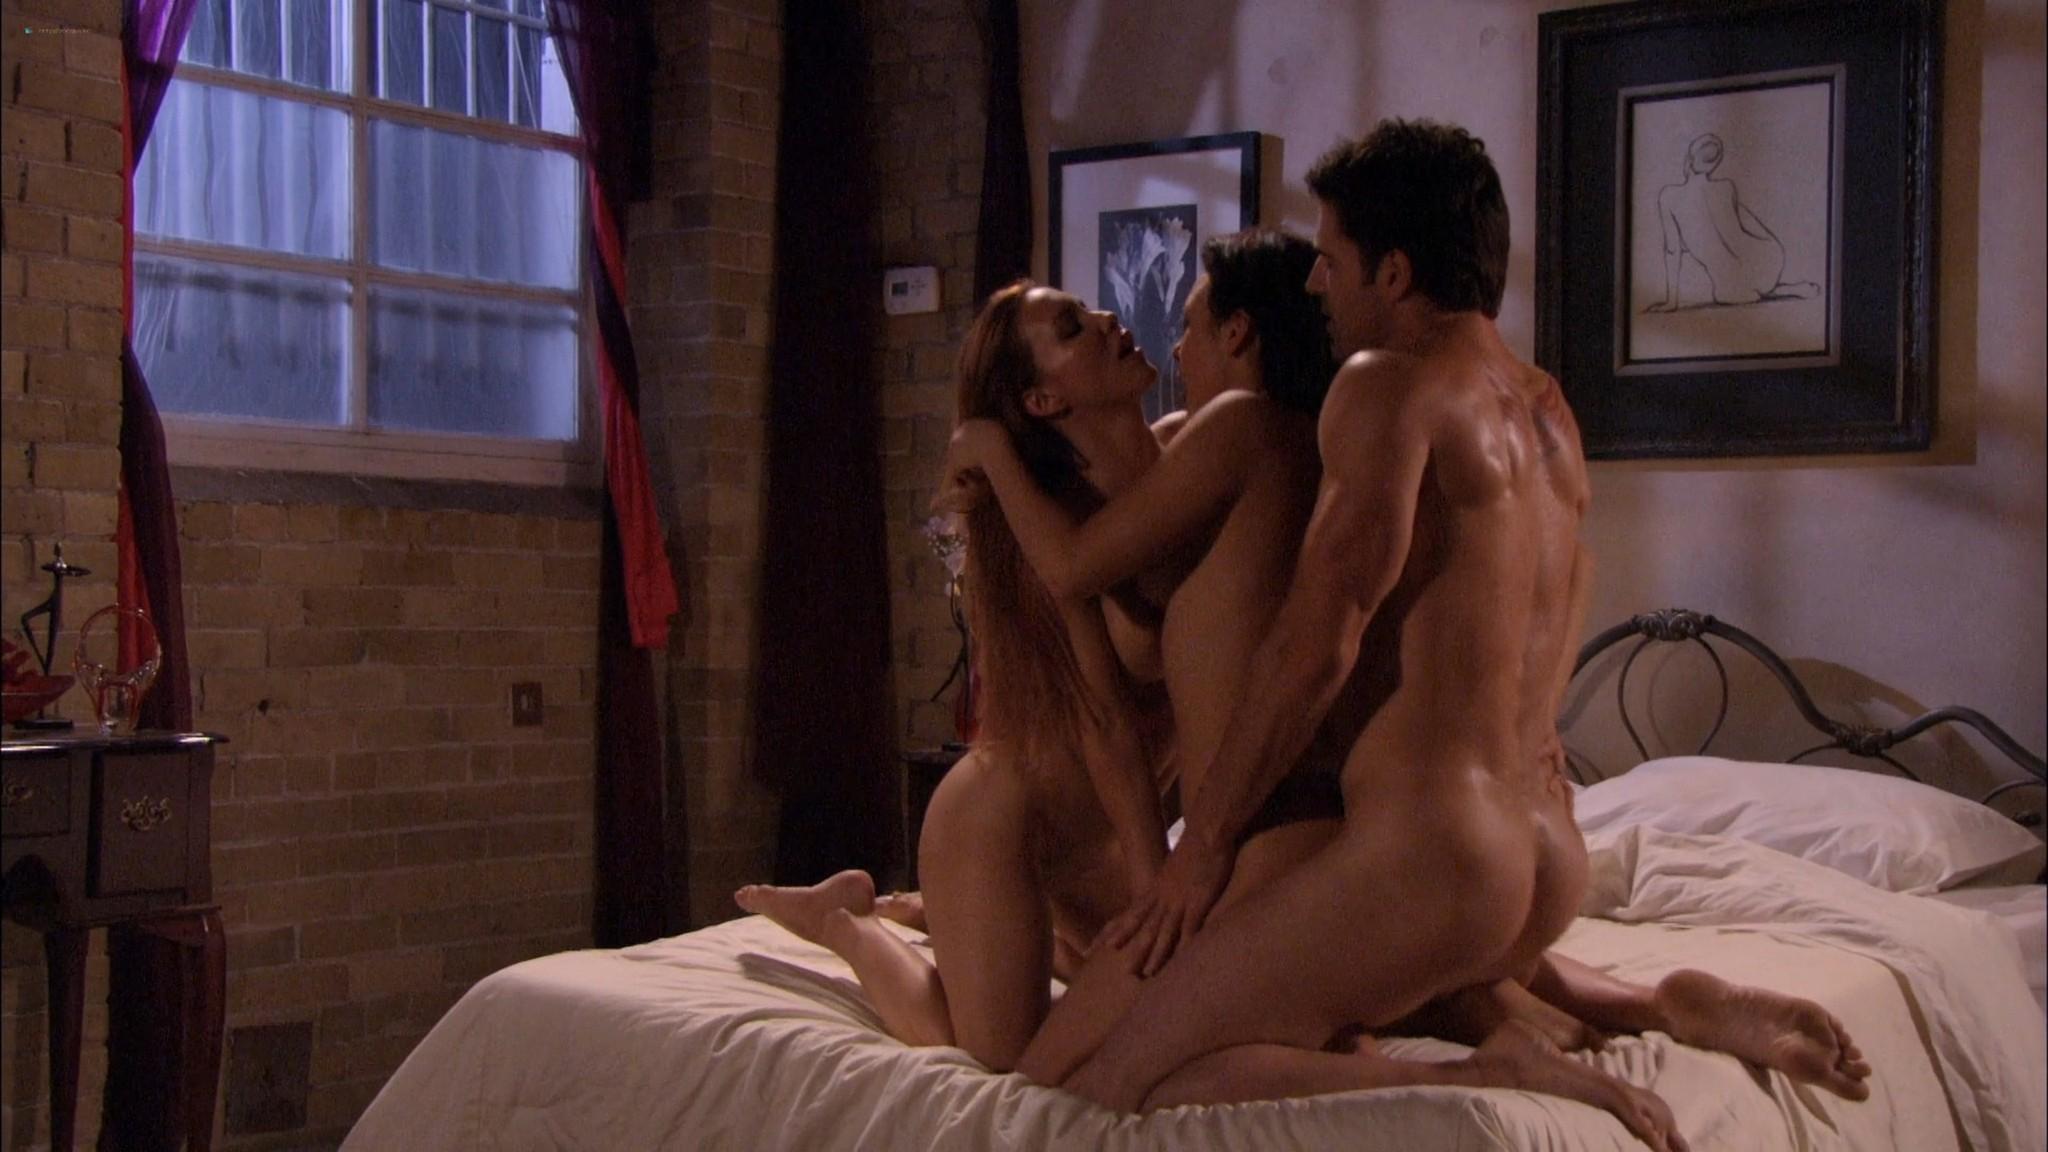 Lana Tailor nude sex threesome Noelle DuBois Allison Wood etc nude sex too Lingerie 2010 s2e5 HD 1080p 015